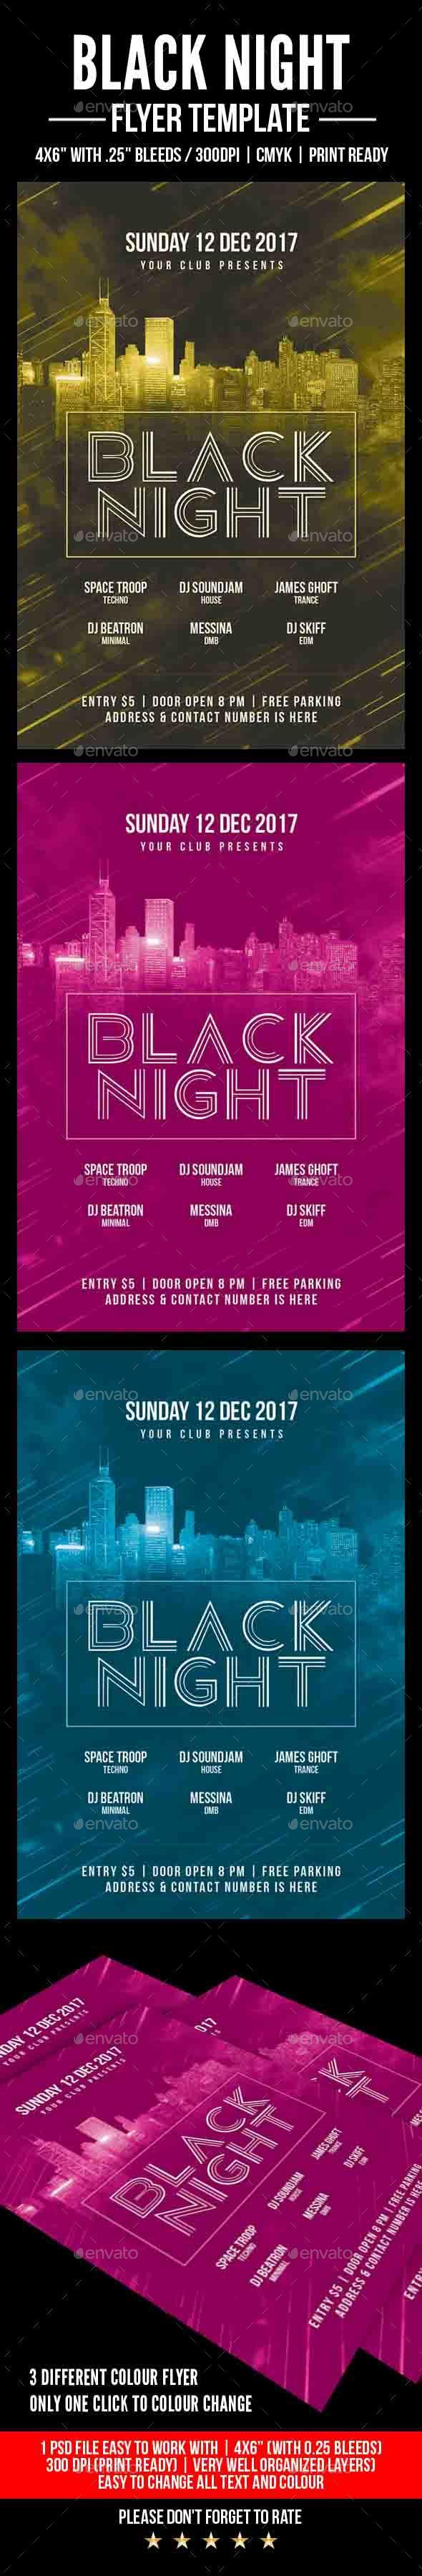 Black Night Flyer - Events Flyers